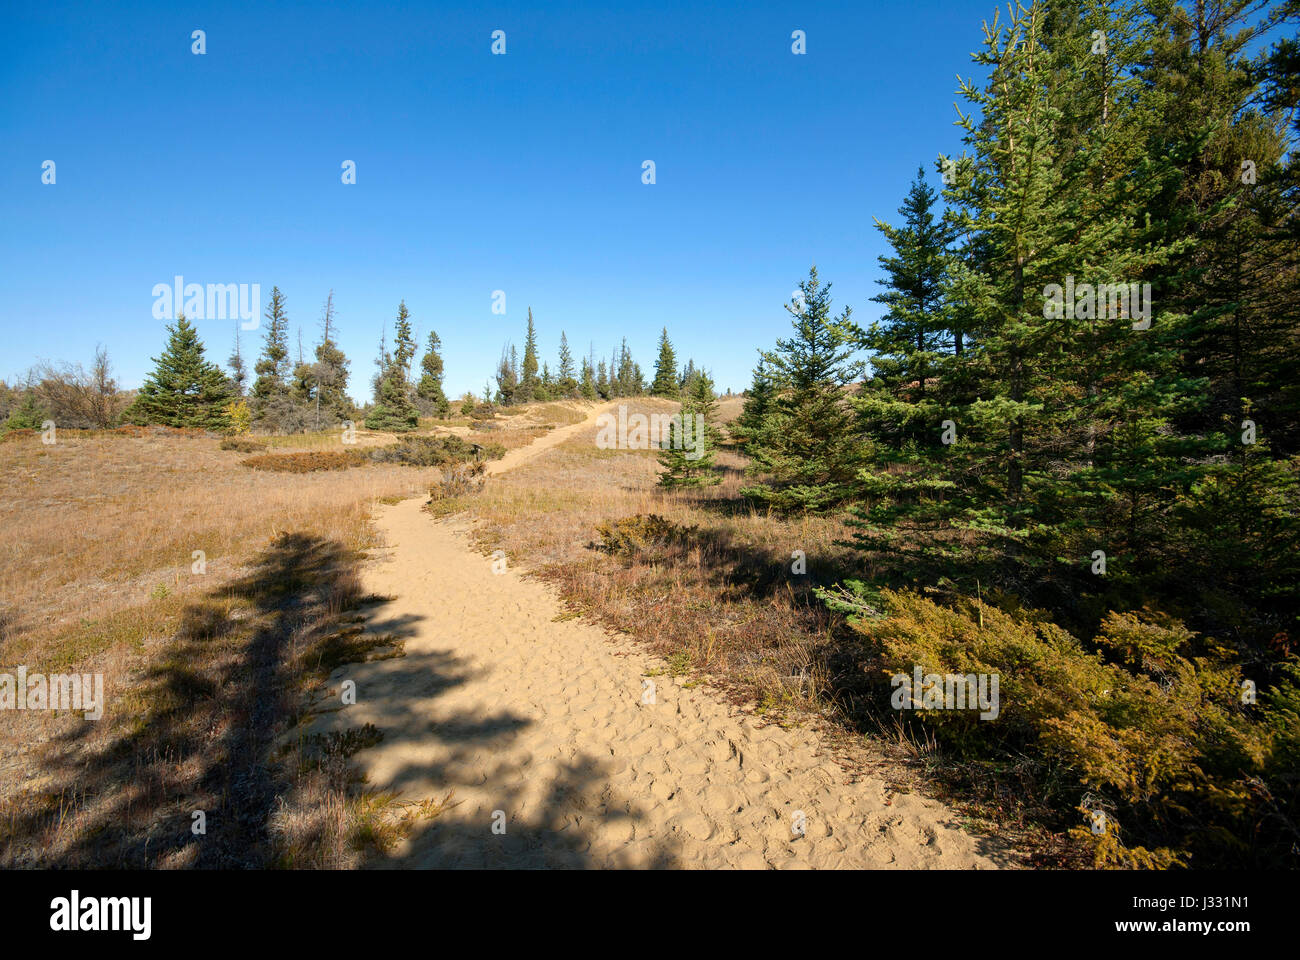 Spirit Sands trail, Spruce Woods Provincial Park, Manitoba, Canada - Stock Image